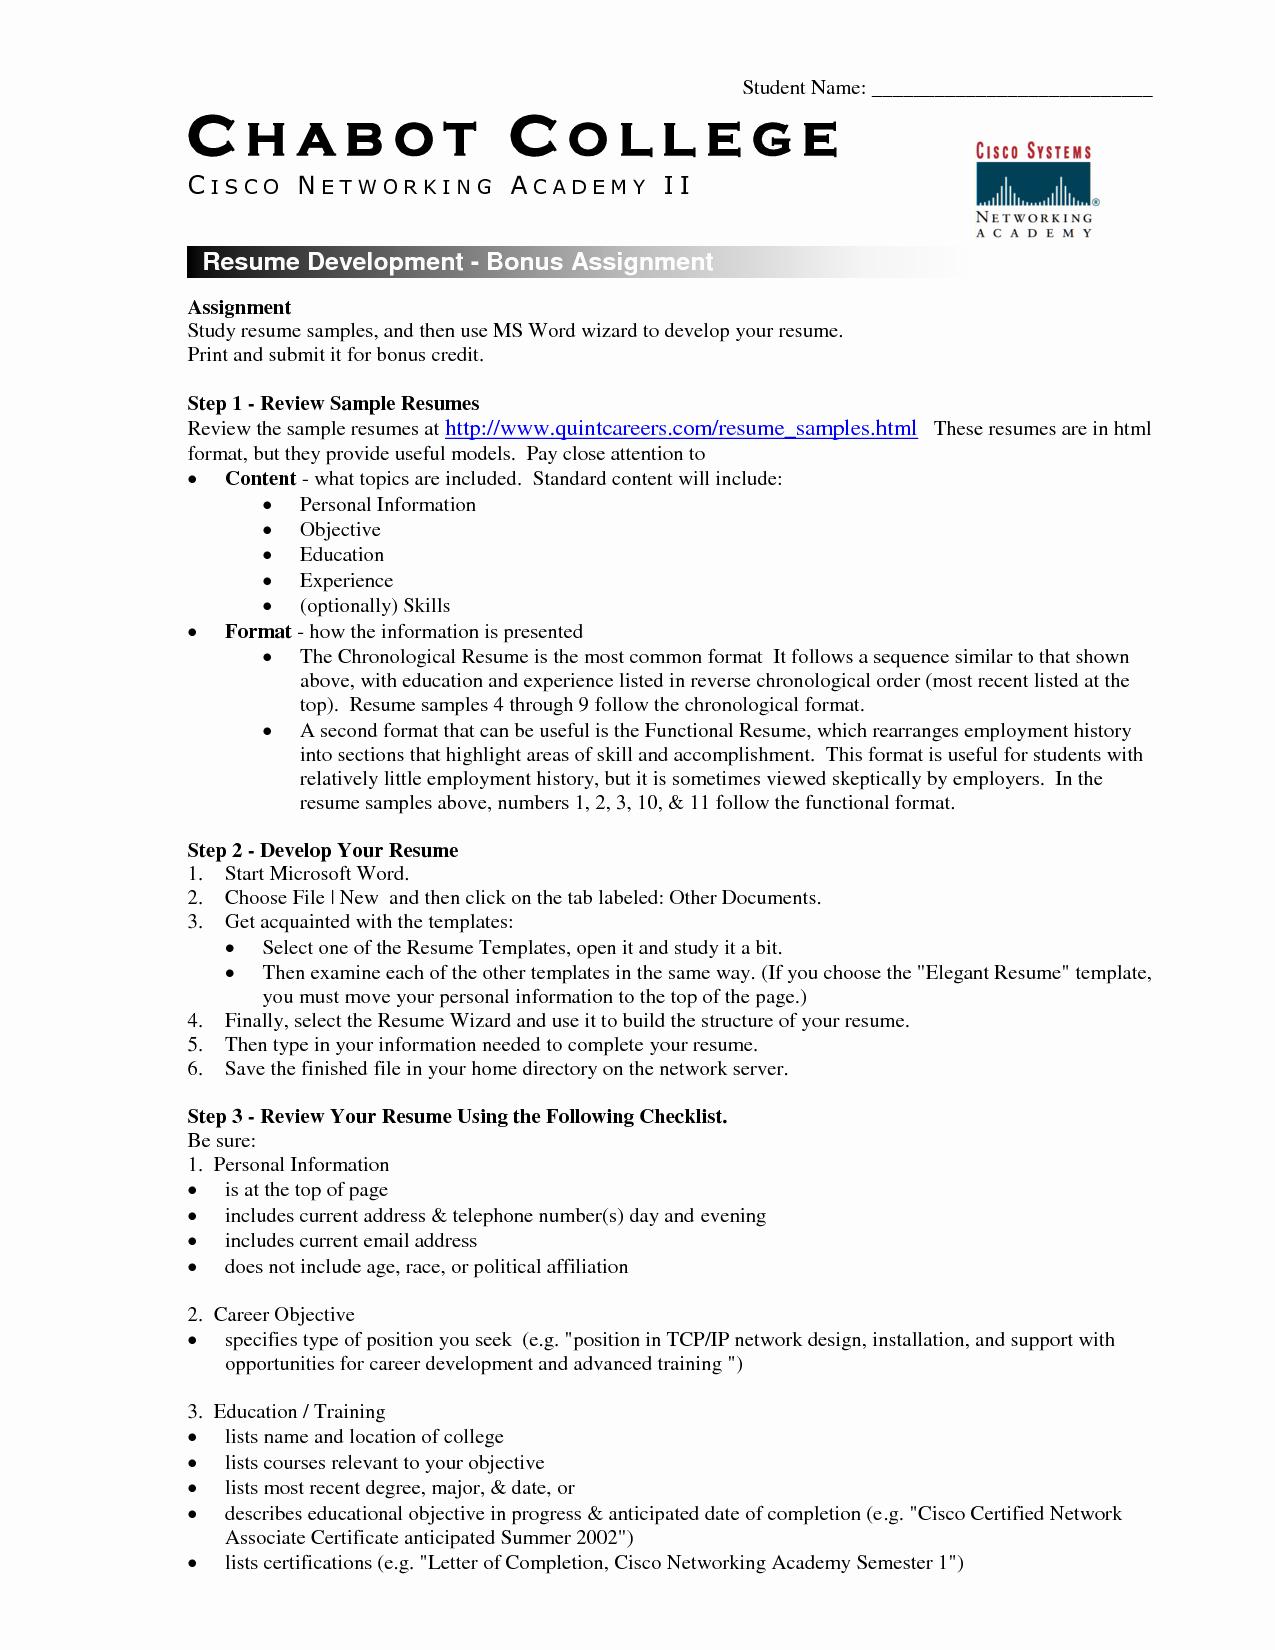 Microsoft Word Resume Template 2017 Beautiful College Student Resume Template Microsoft Word